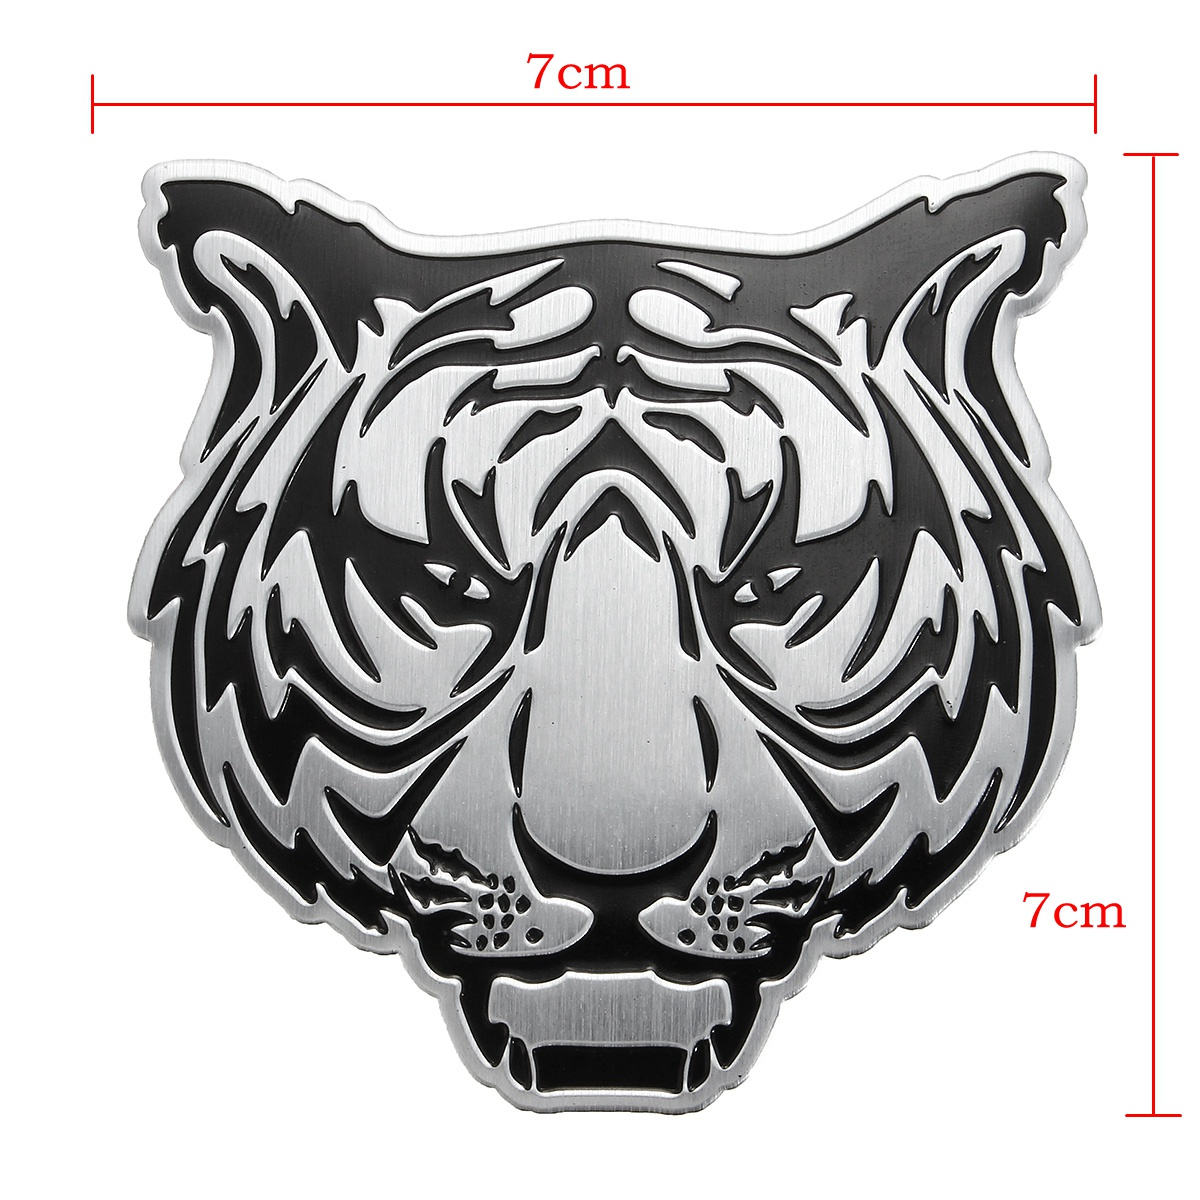 3D DIY Silver Animals Head Metal Logo Sticker Car Motorcycle Badge Emblem Decals